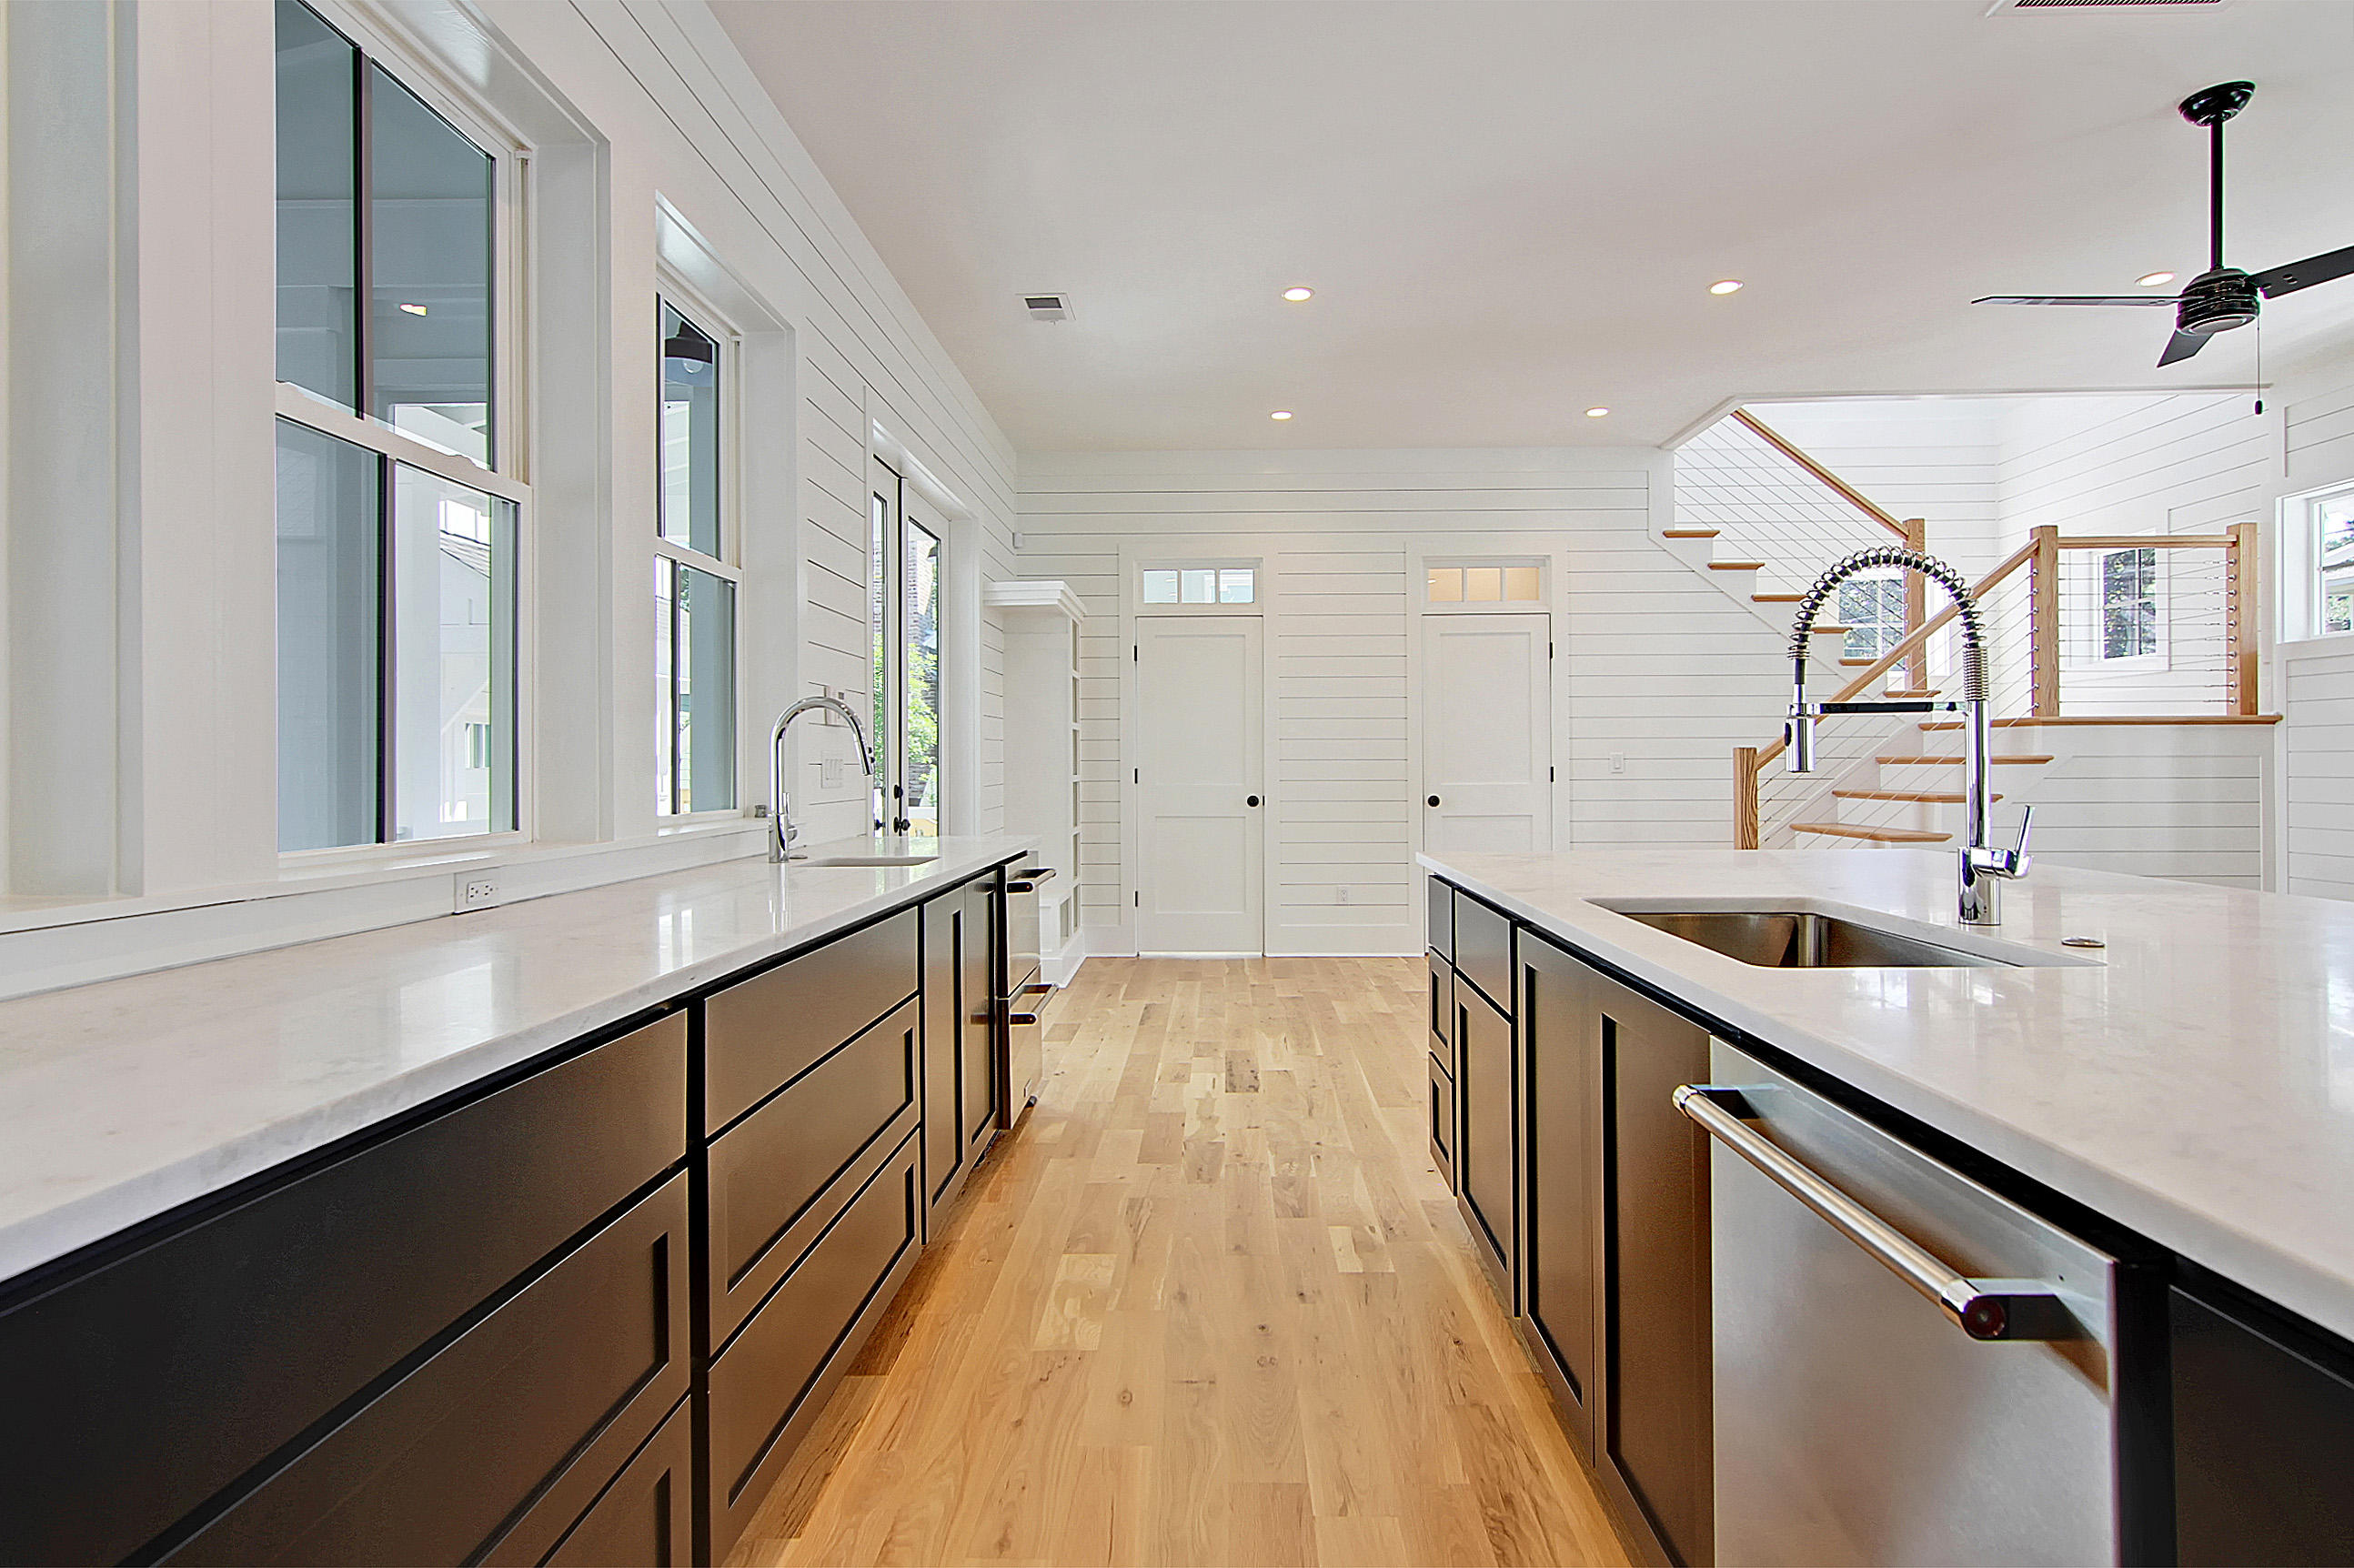 Old Mt Pleasant Homes For Sale - 733 Atlantic, Mount Pleasant, SC - 13